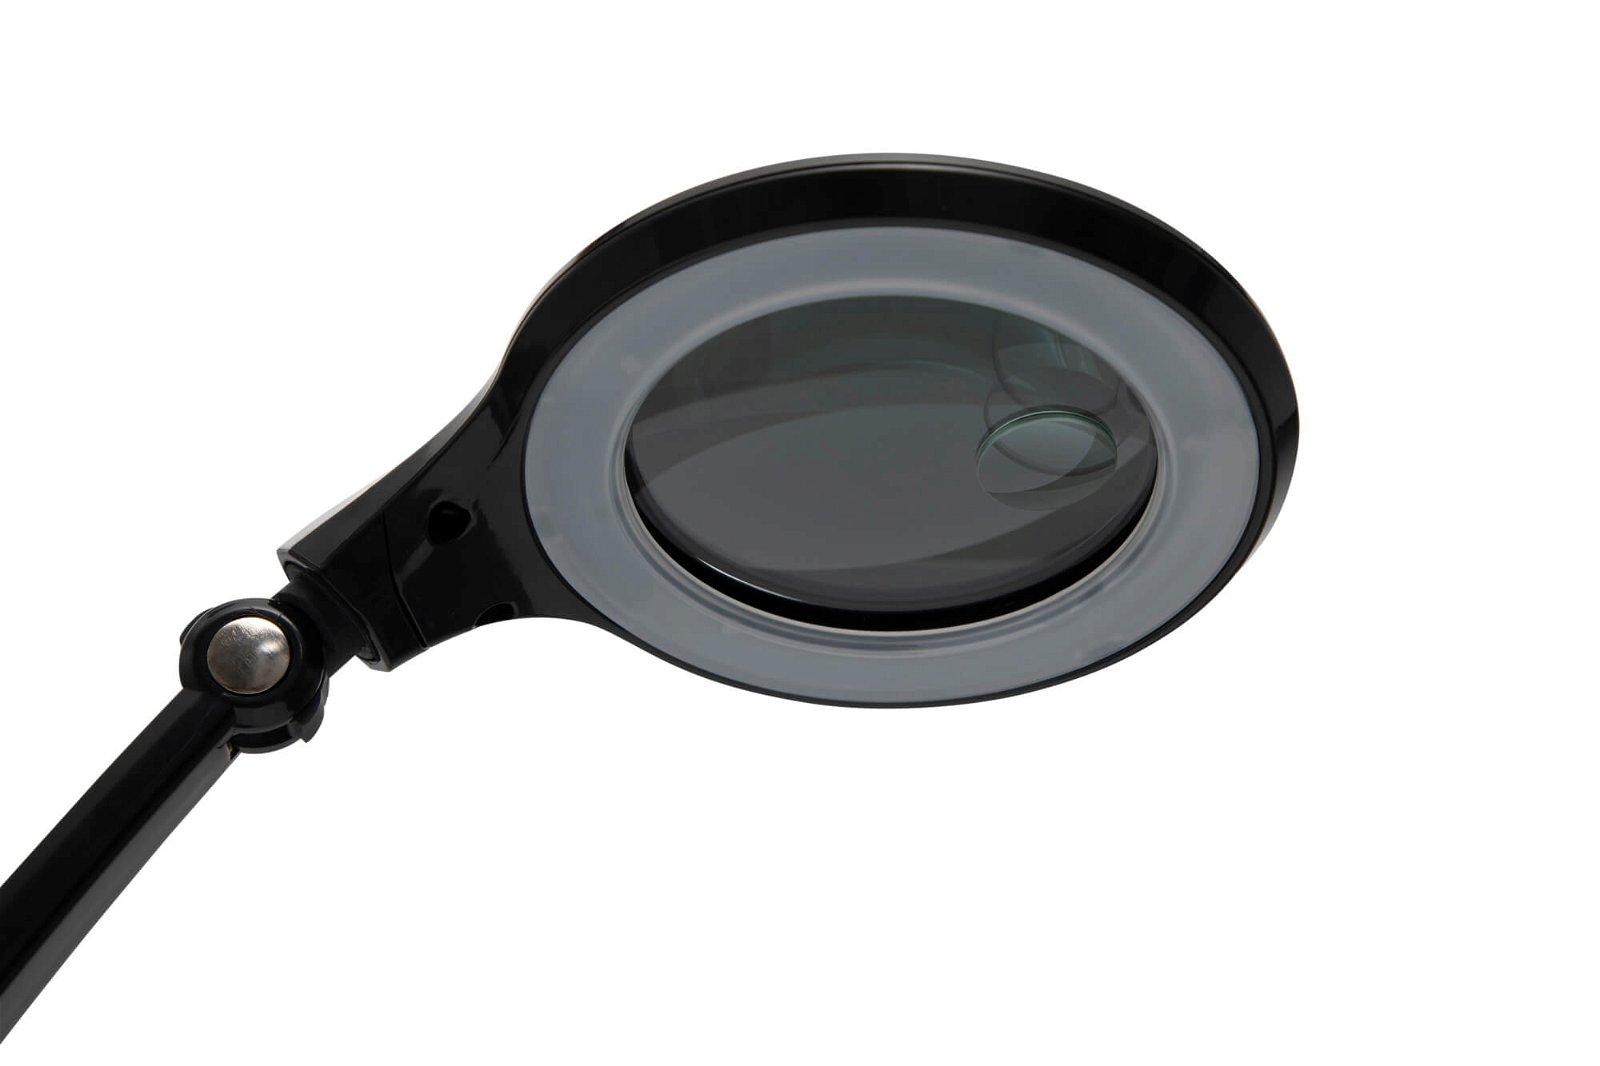 LED-Lupenleuchte MAULiris, schwarz, dimmbar